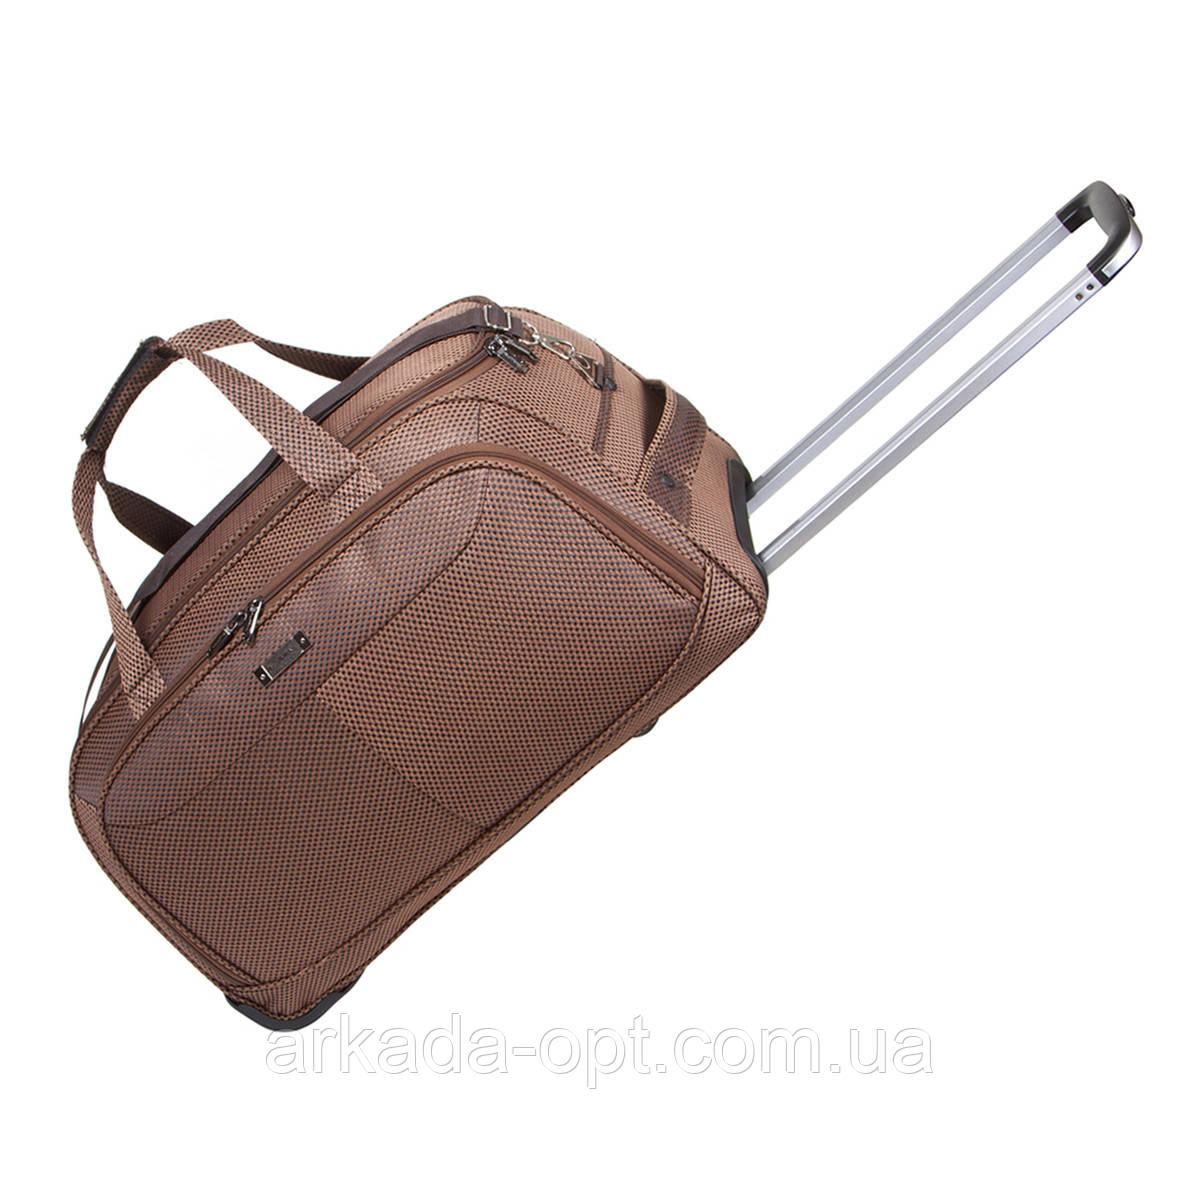 Дорожная сумка FILIPPINI малая три колеса  57х30х35  коричневая ксТ0045корм